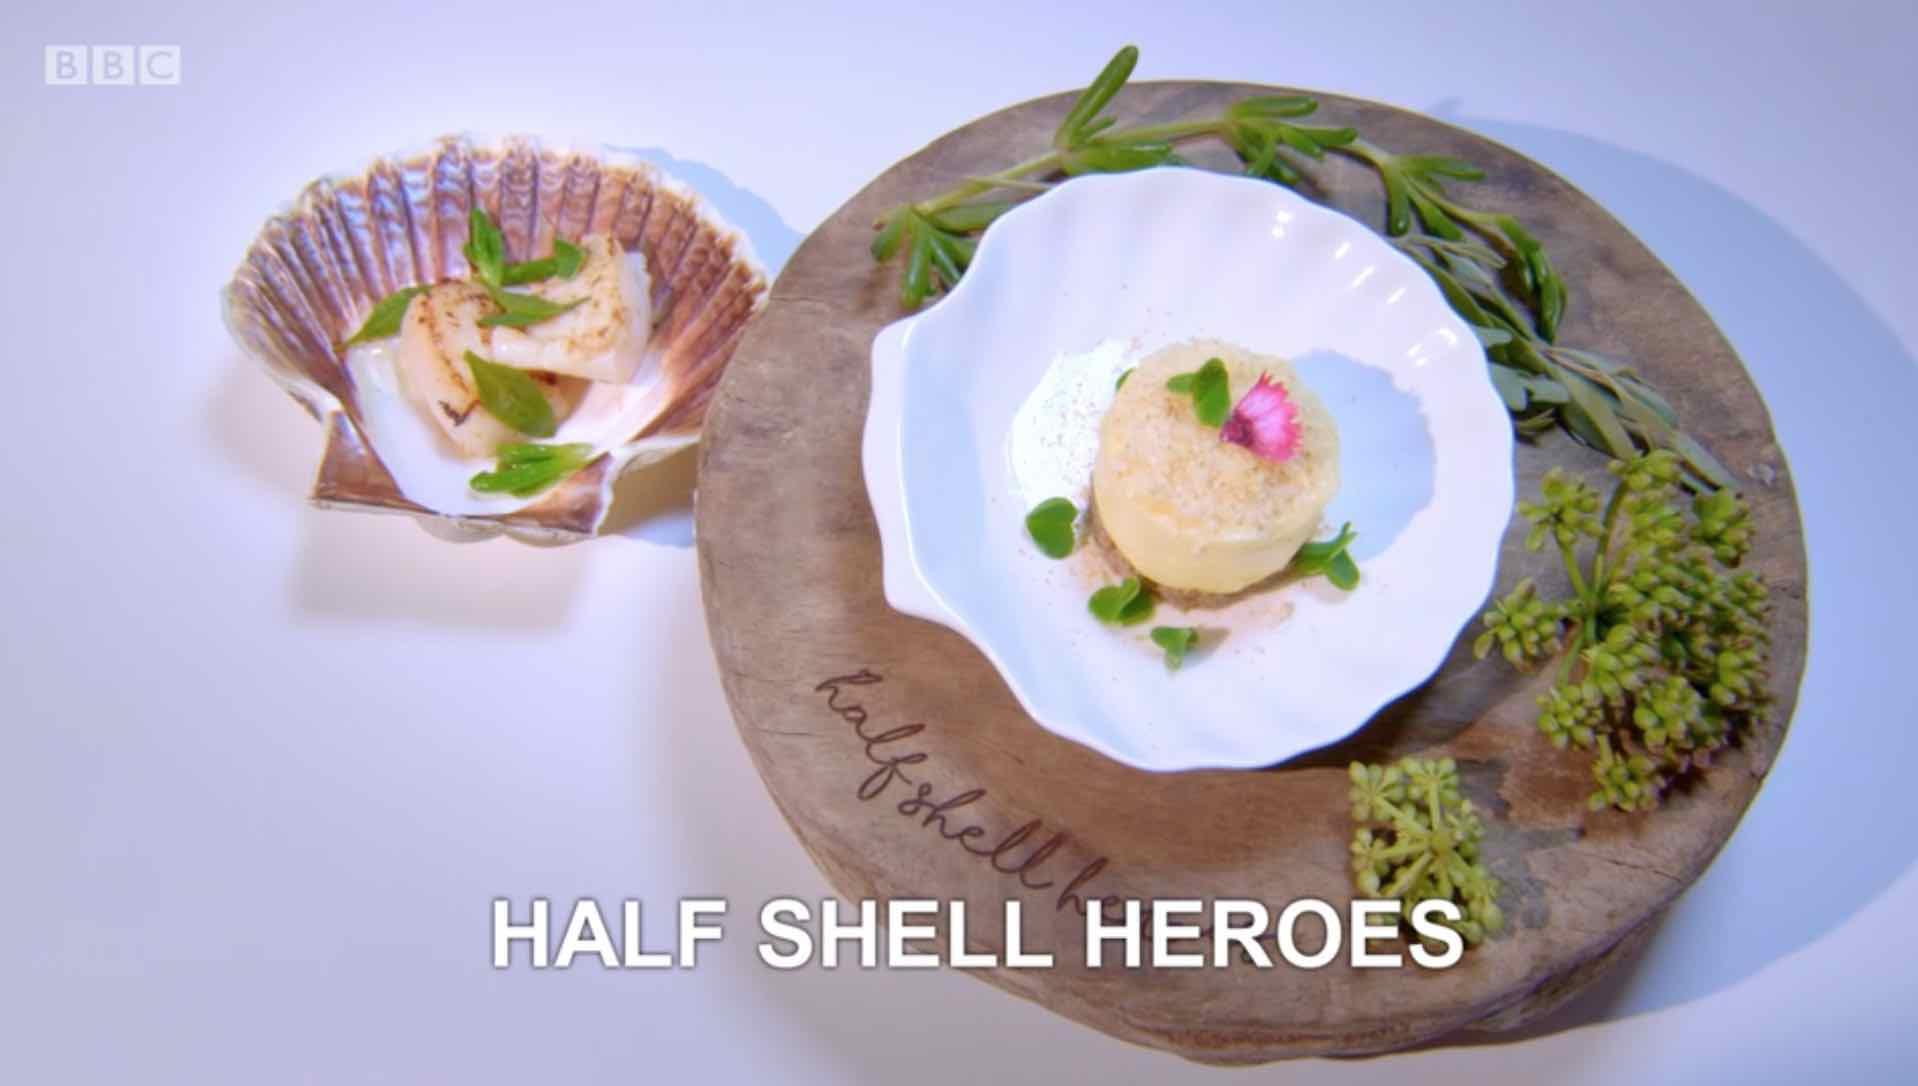 *HALF SHELL HEROES*